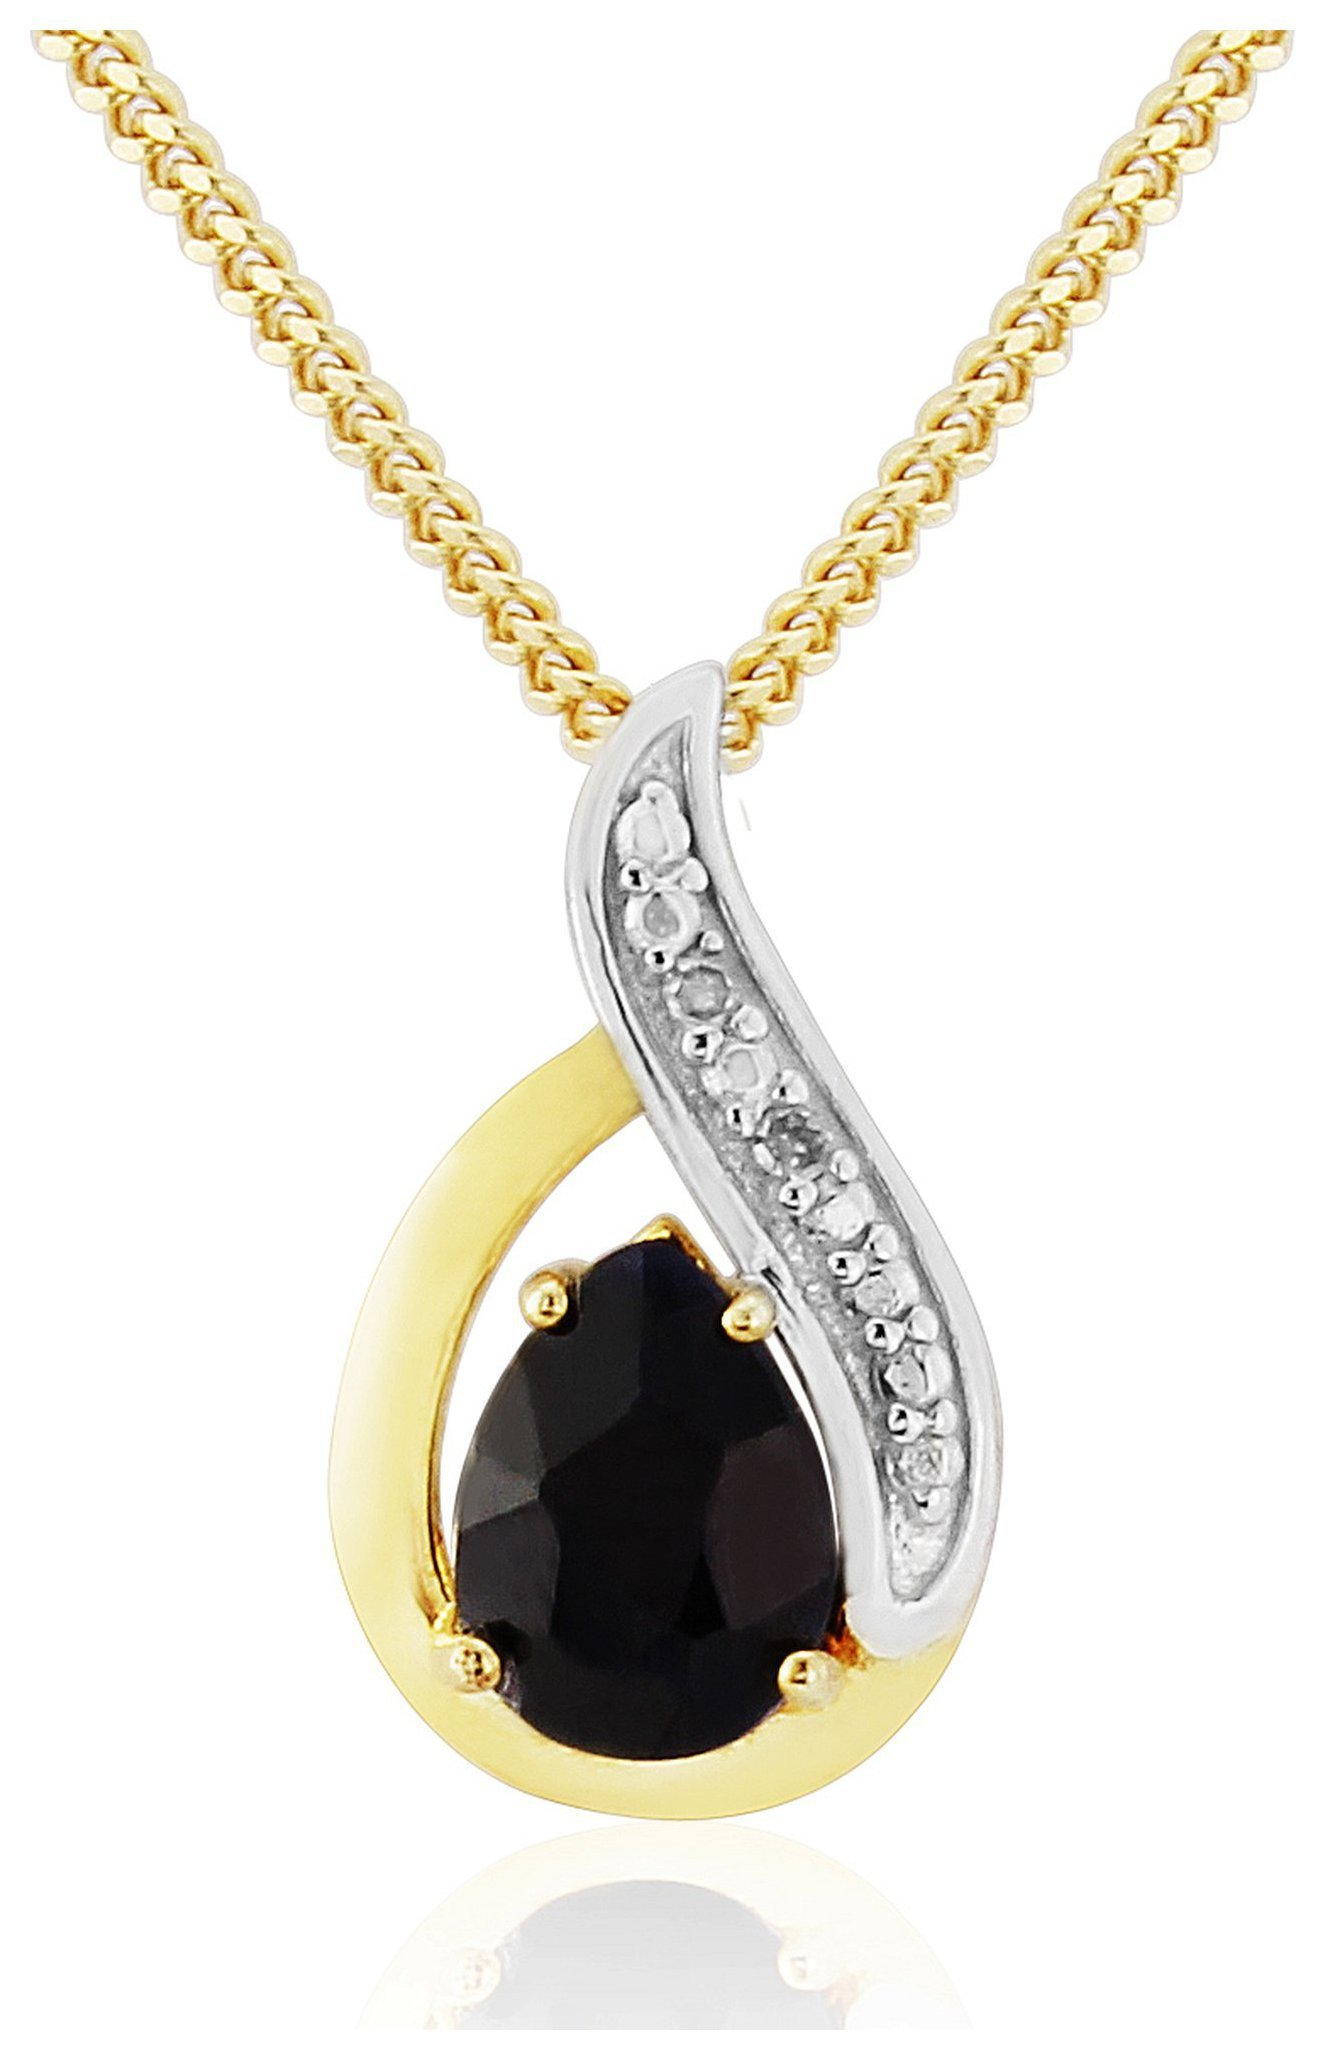 9 Carat Gold - Plated - Sterling Silver - Sapphire/Diamond Set Pendant